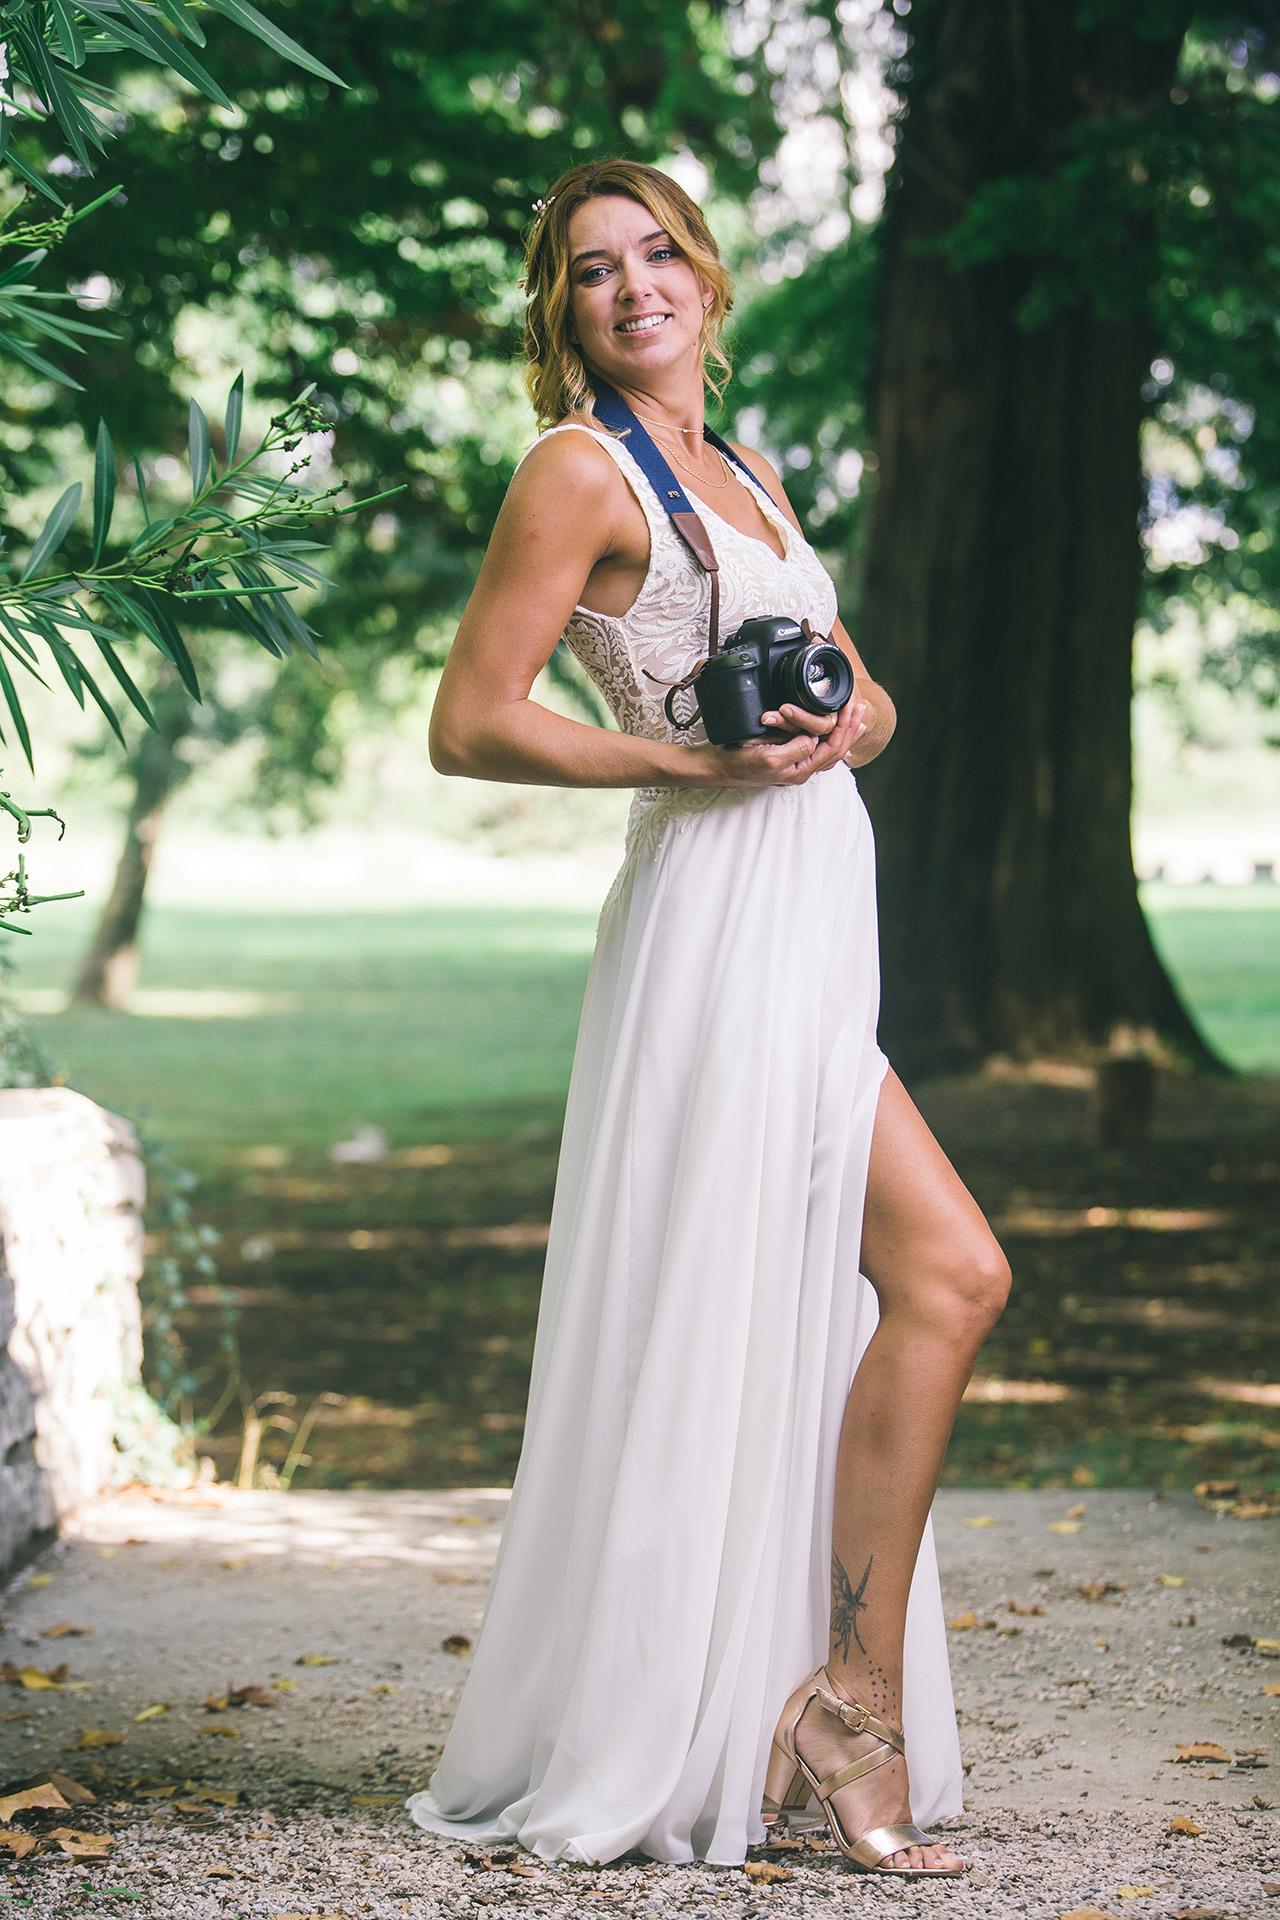 aurelie-ungaro-photographe-mariage-shooting-photo